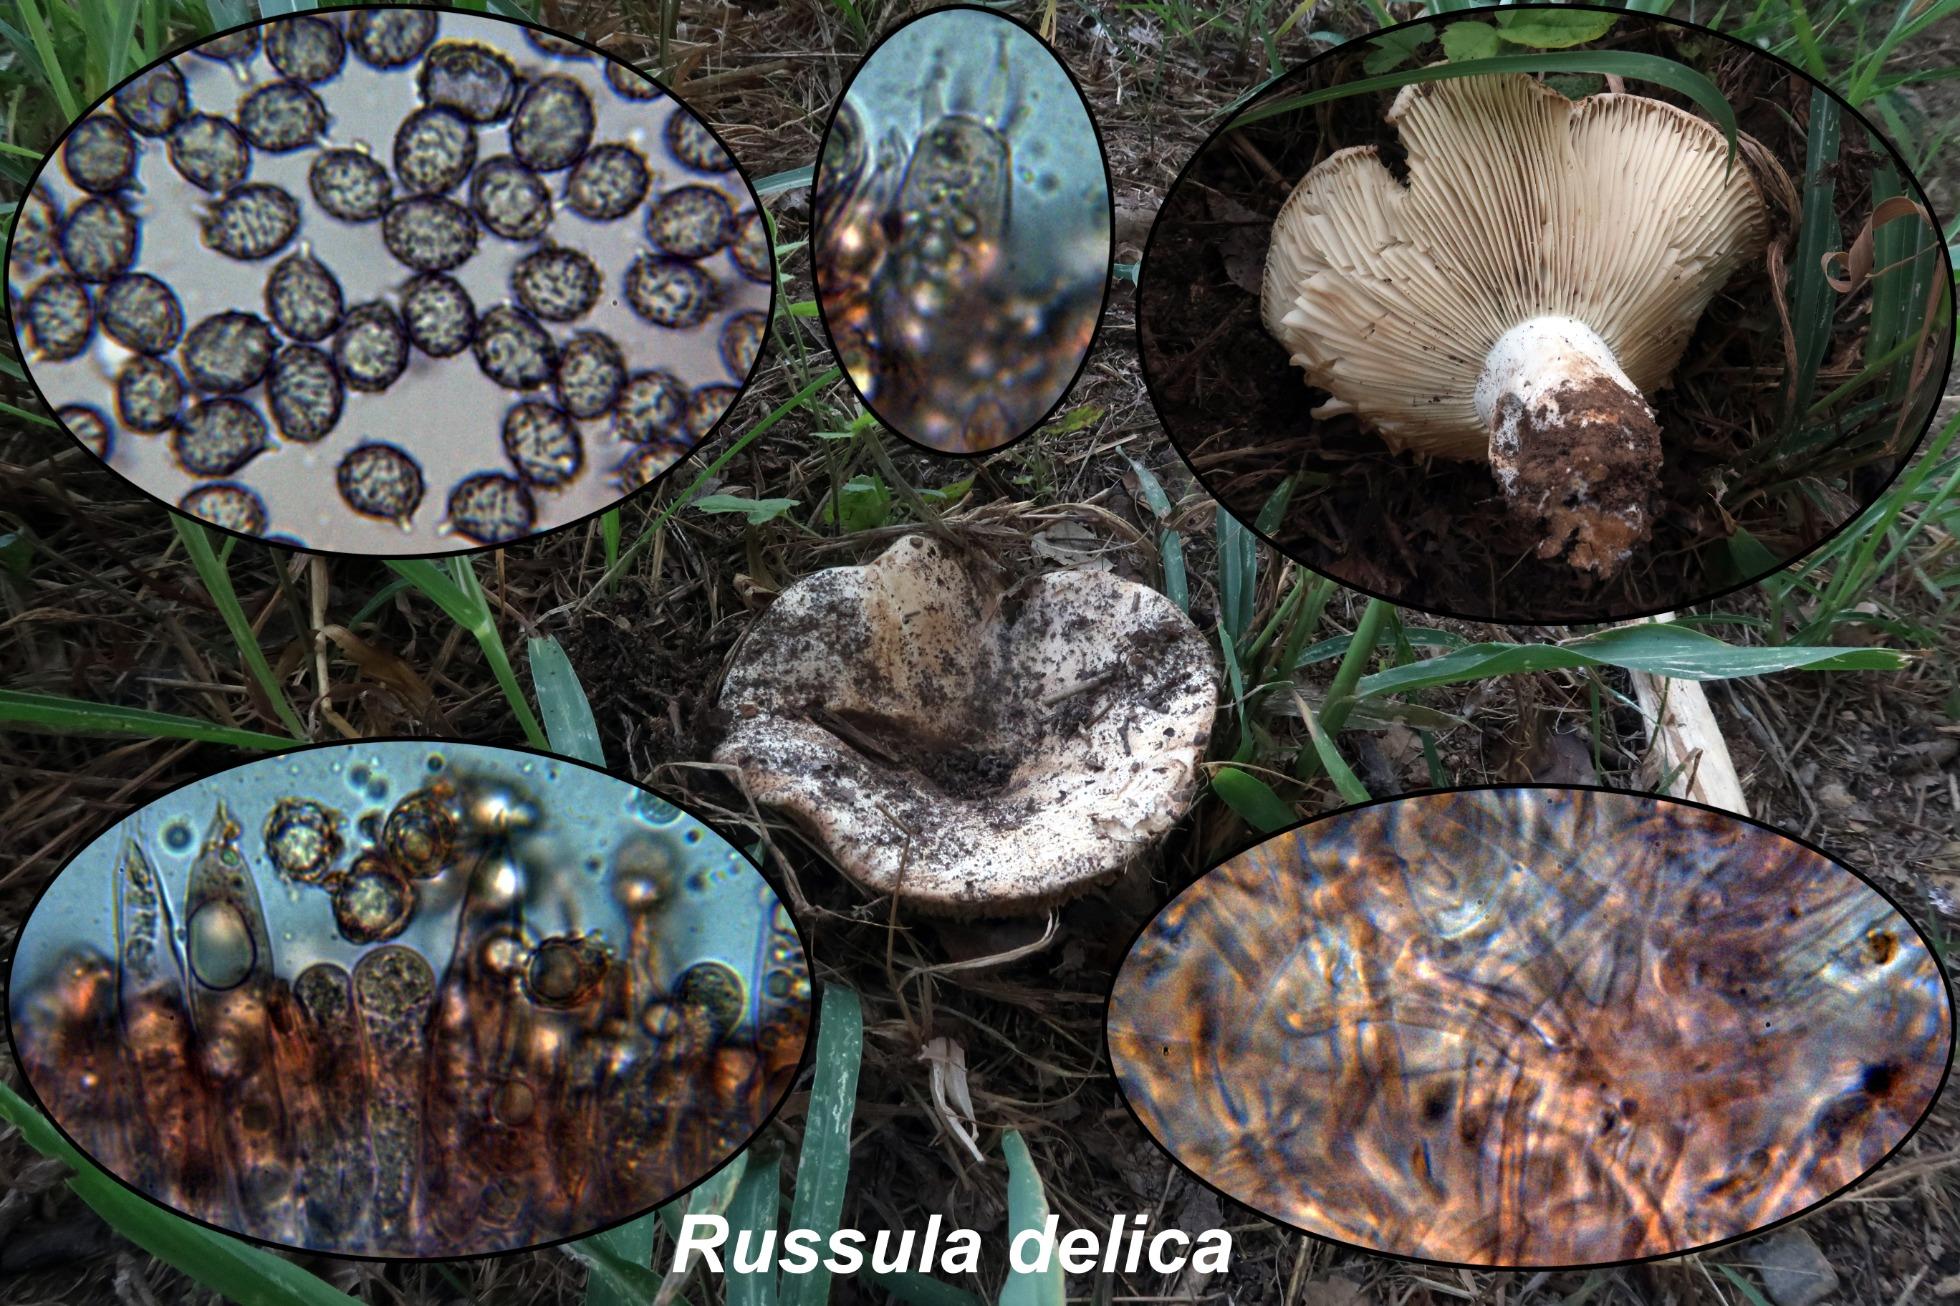 Russuladelica_2020-11-16.jpg